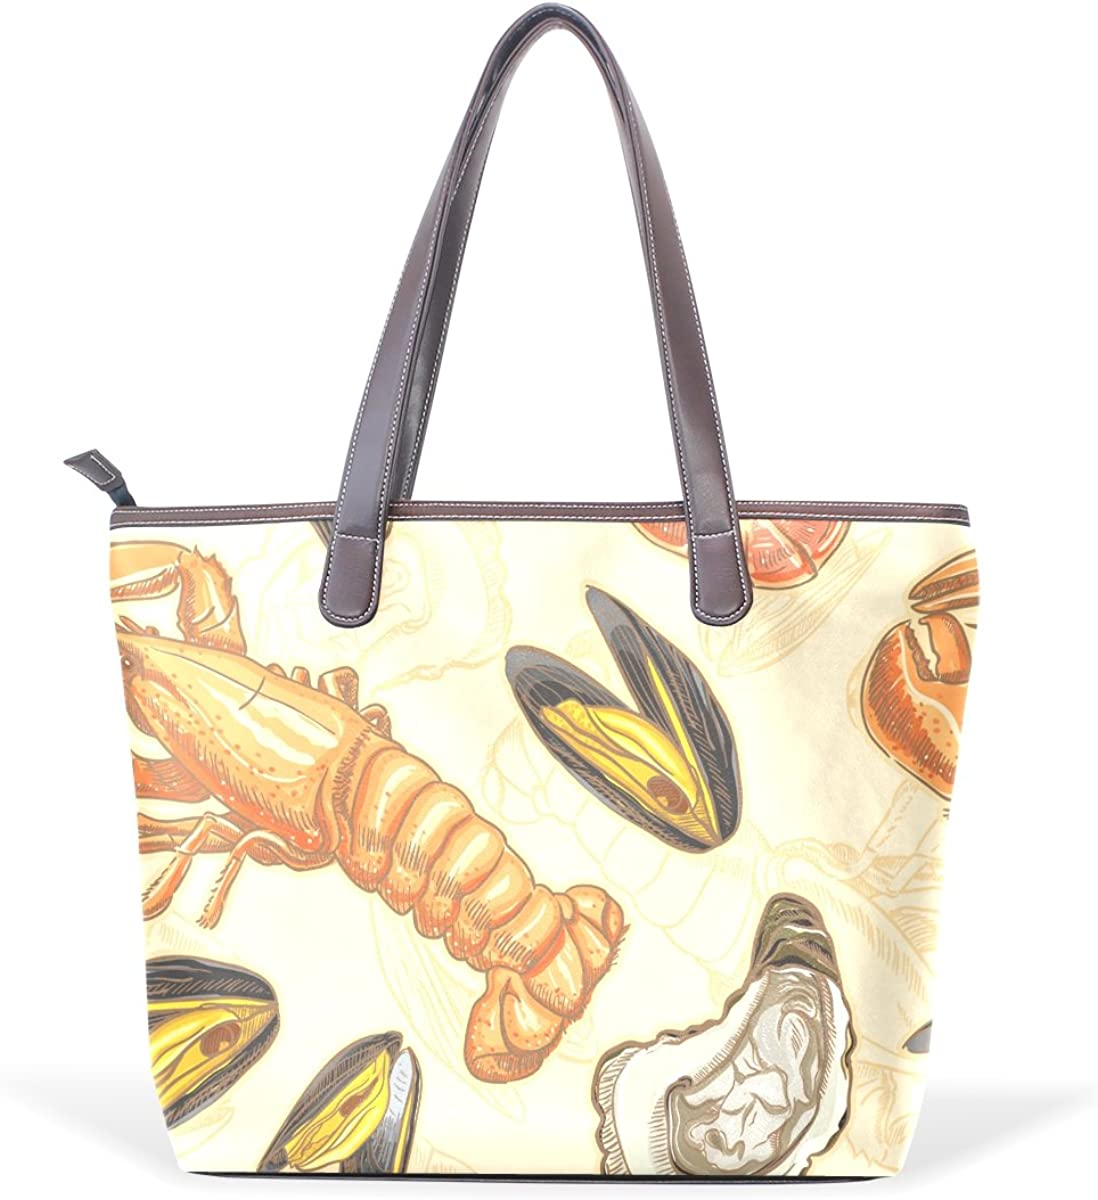 Sunlome Seafood Shrimp Scallop Pattern Handbags For Women Girls PU Leather Shoulder Tote Bag